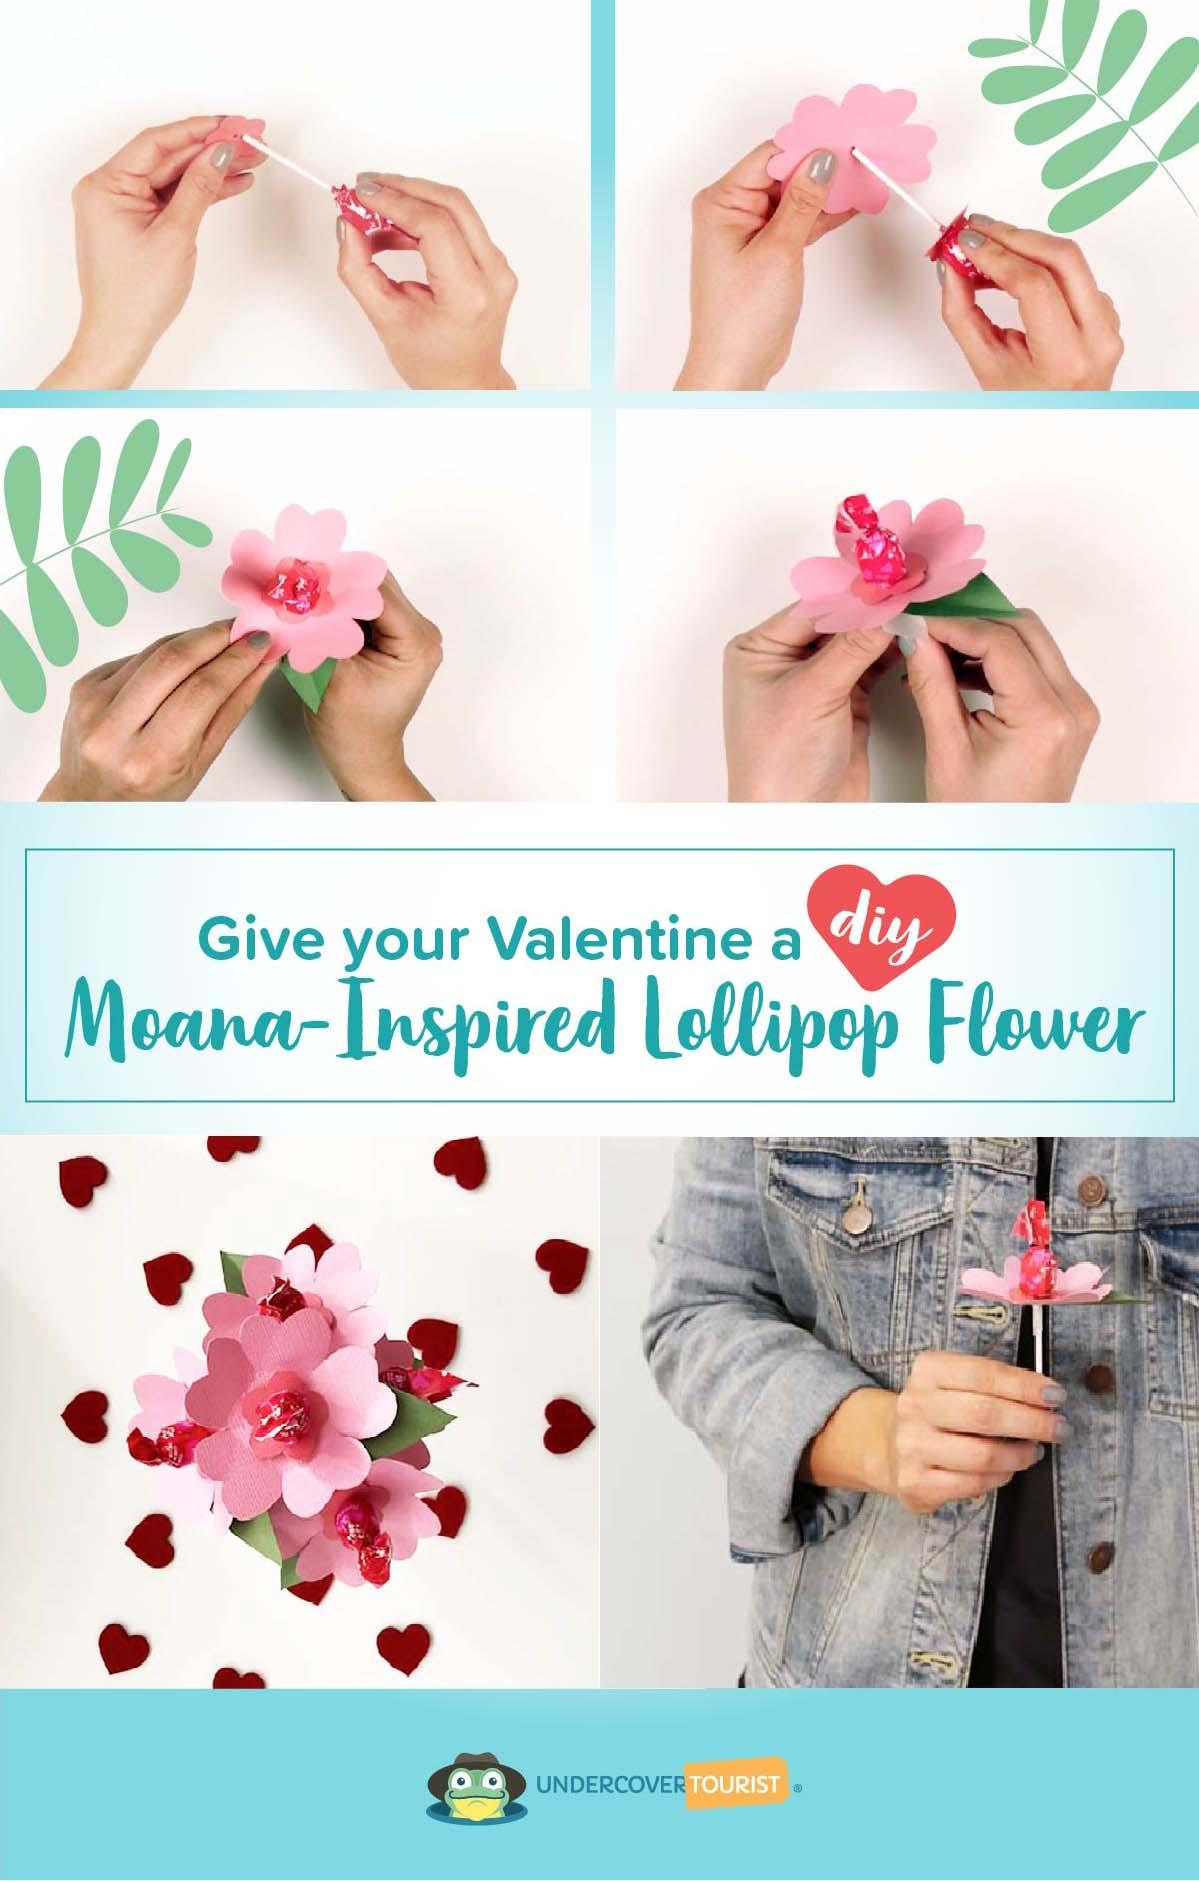 Give Your Valentine A Diy Moana Lollipop Flower